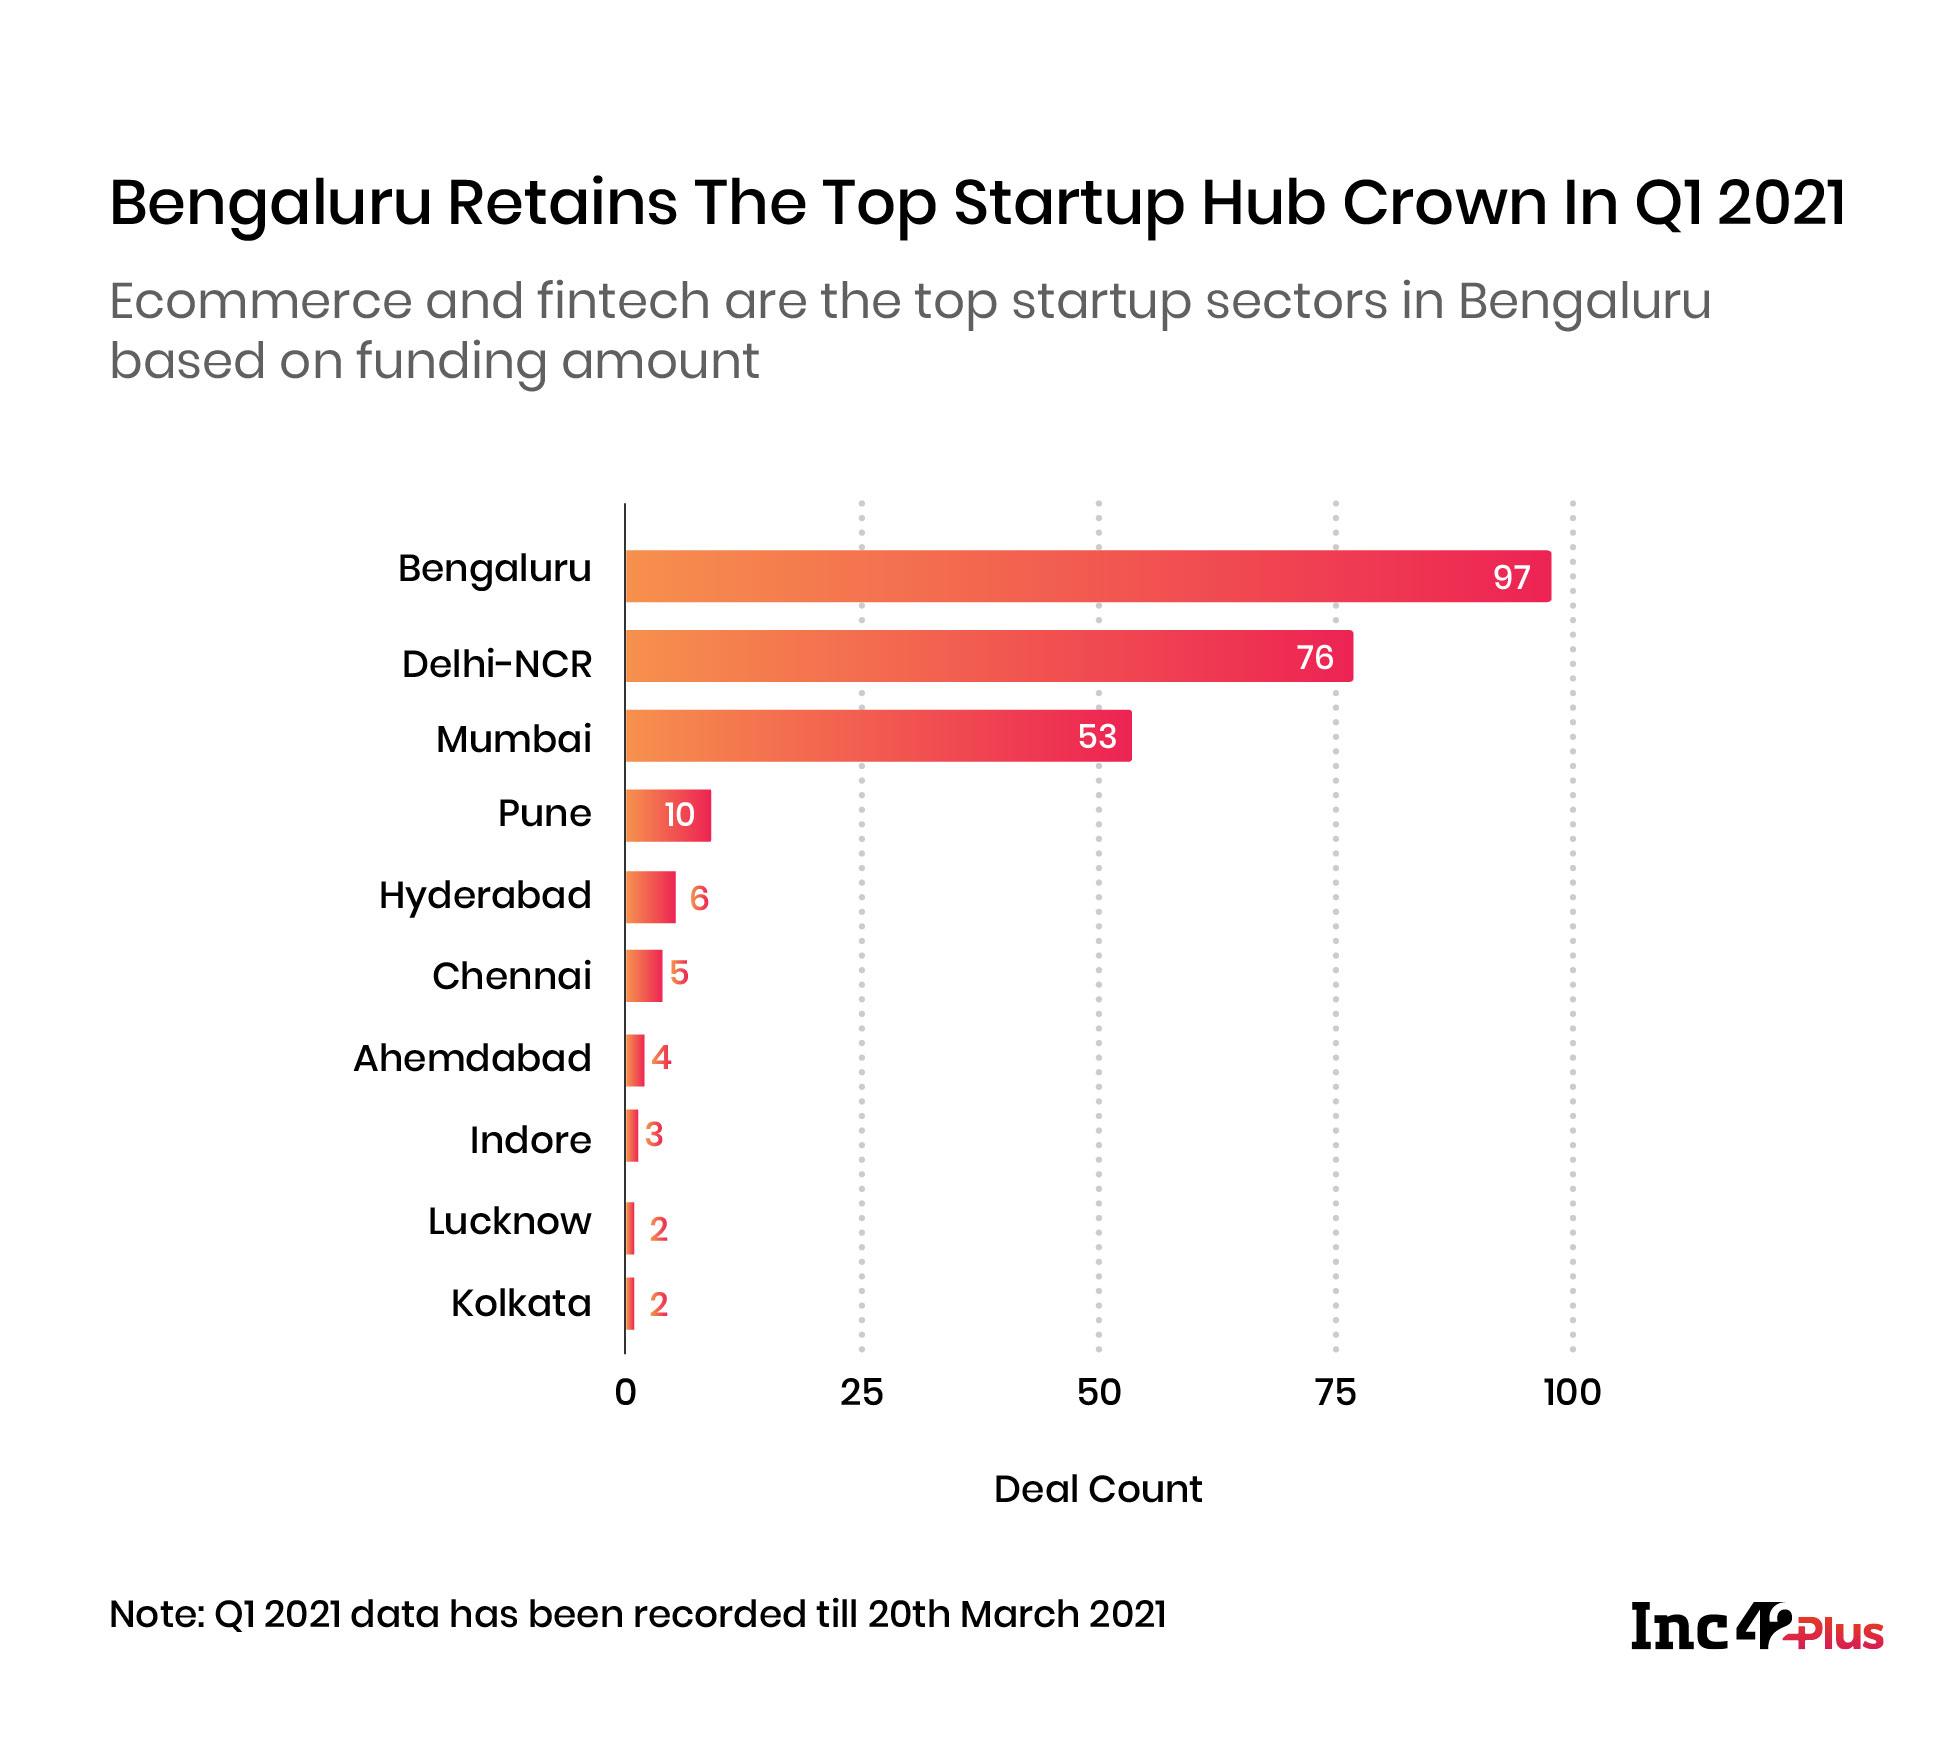 Bengaluru Retains The Top Startup Hub Crown In Q1 2021